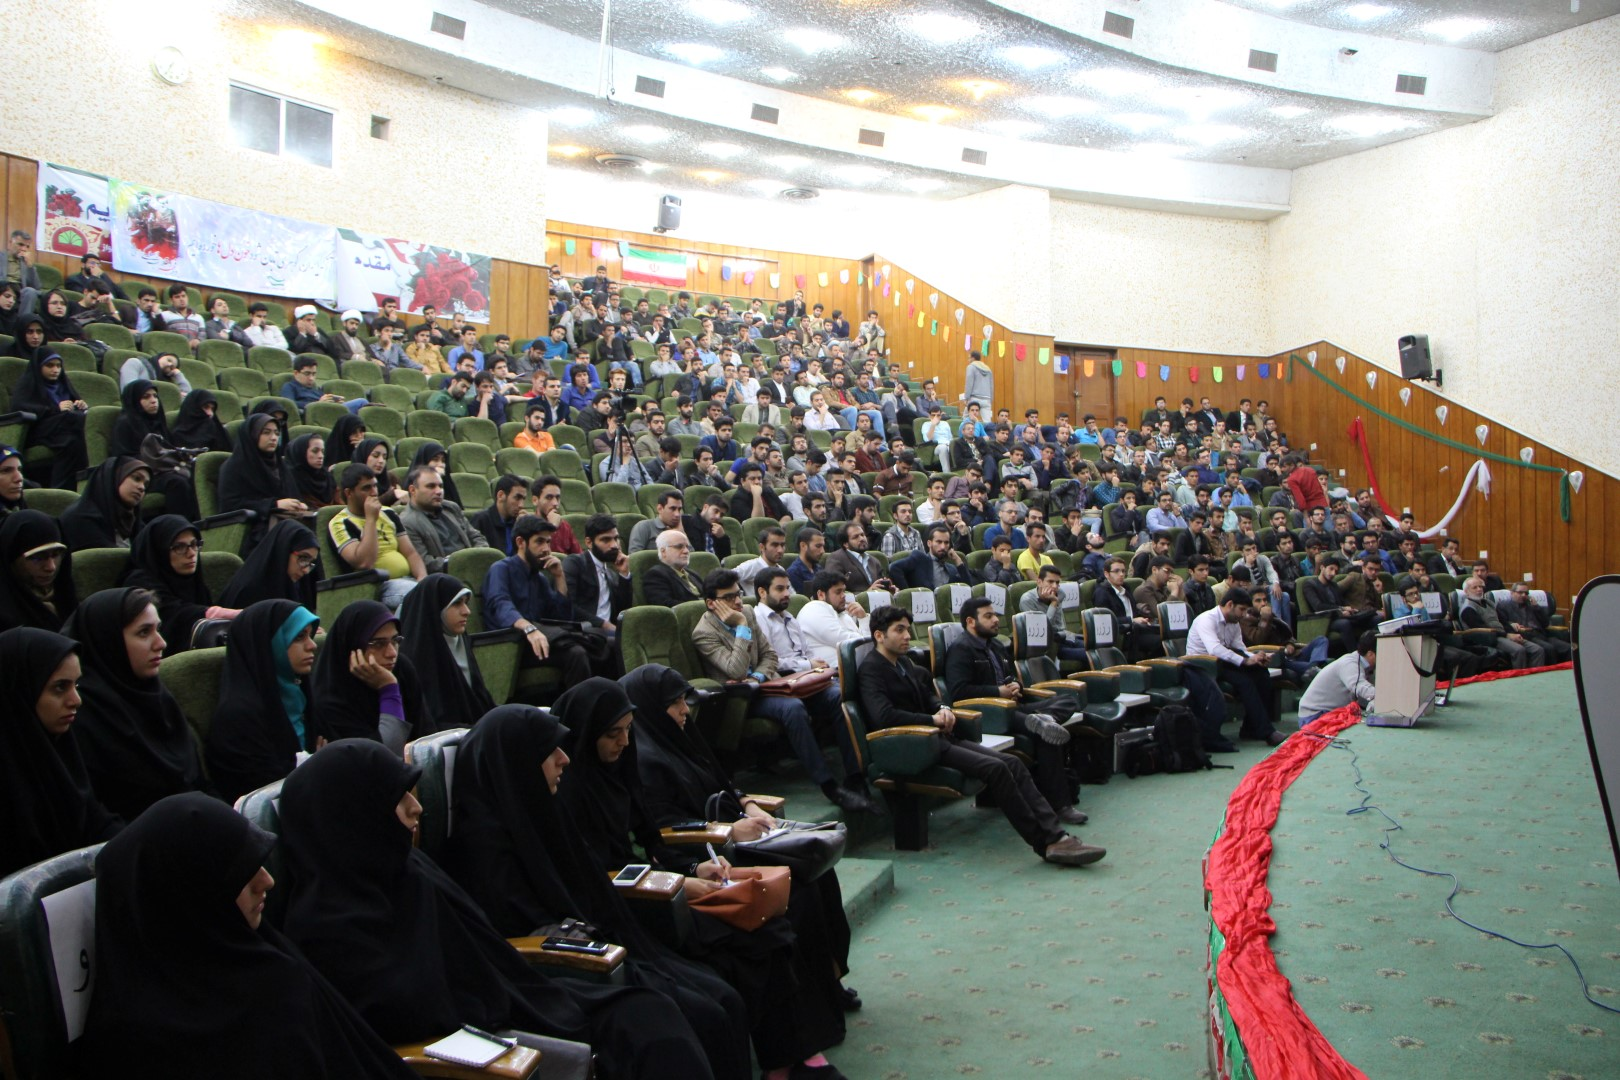 IMG 5217 گزارش تصویری؛ سخنرانی استاد حسن عباسی با موضوع از چوئن لای تا سیاست درهای باز